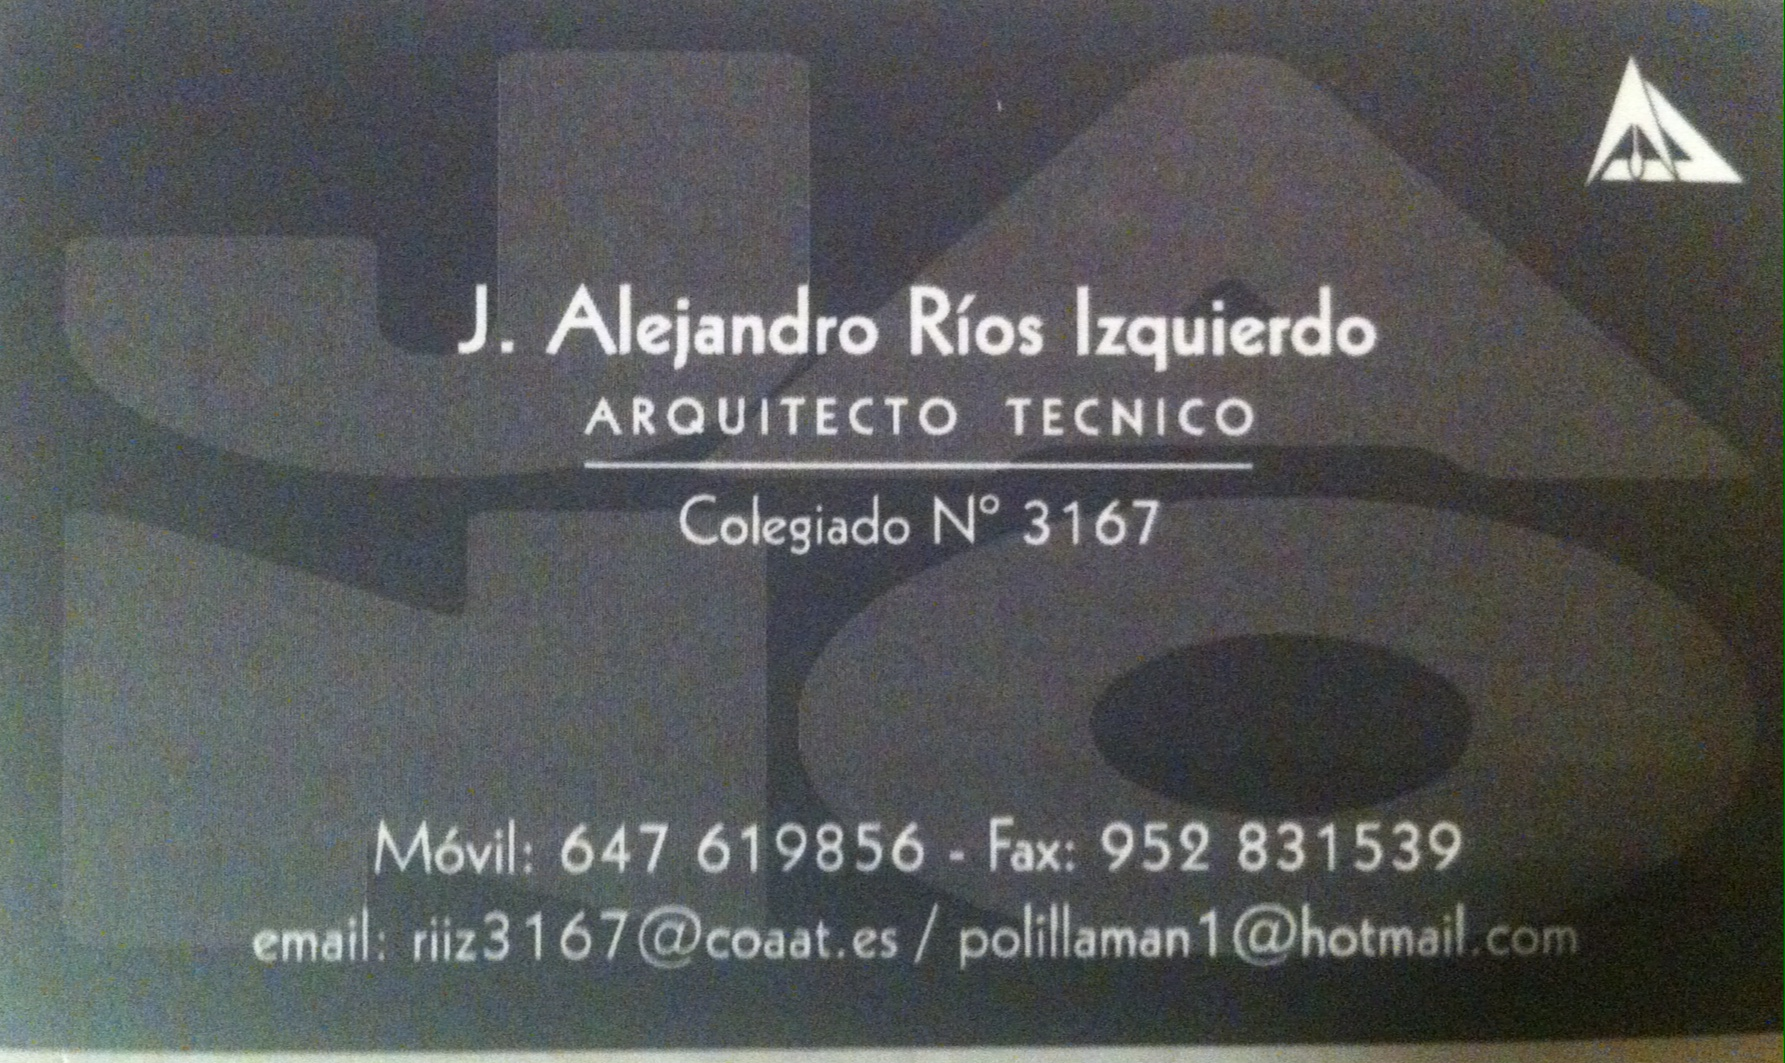 J. Alejandro Rios Izquierdo - Arquitecto Técnico